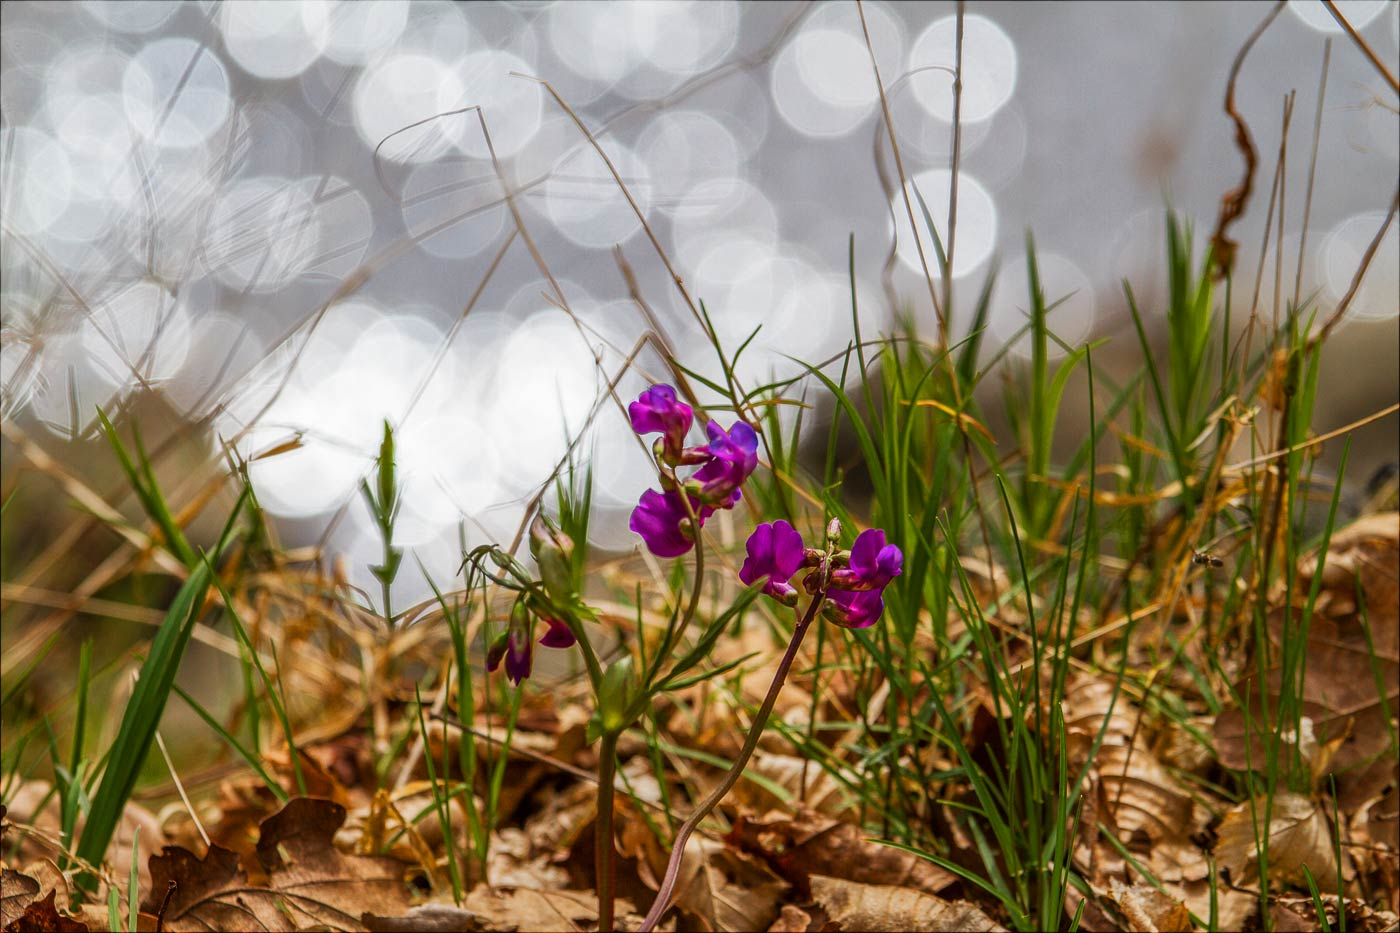 http://countryczech.com/wp-content/uploads/2017/03/photos/20160403-141235_Vltava_Kobyli_draha.jpg